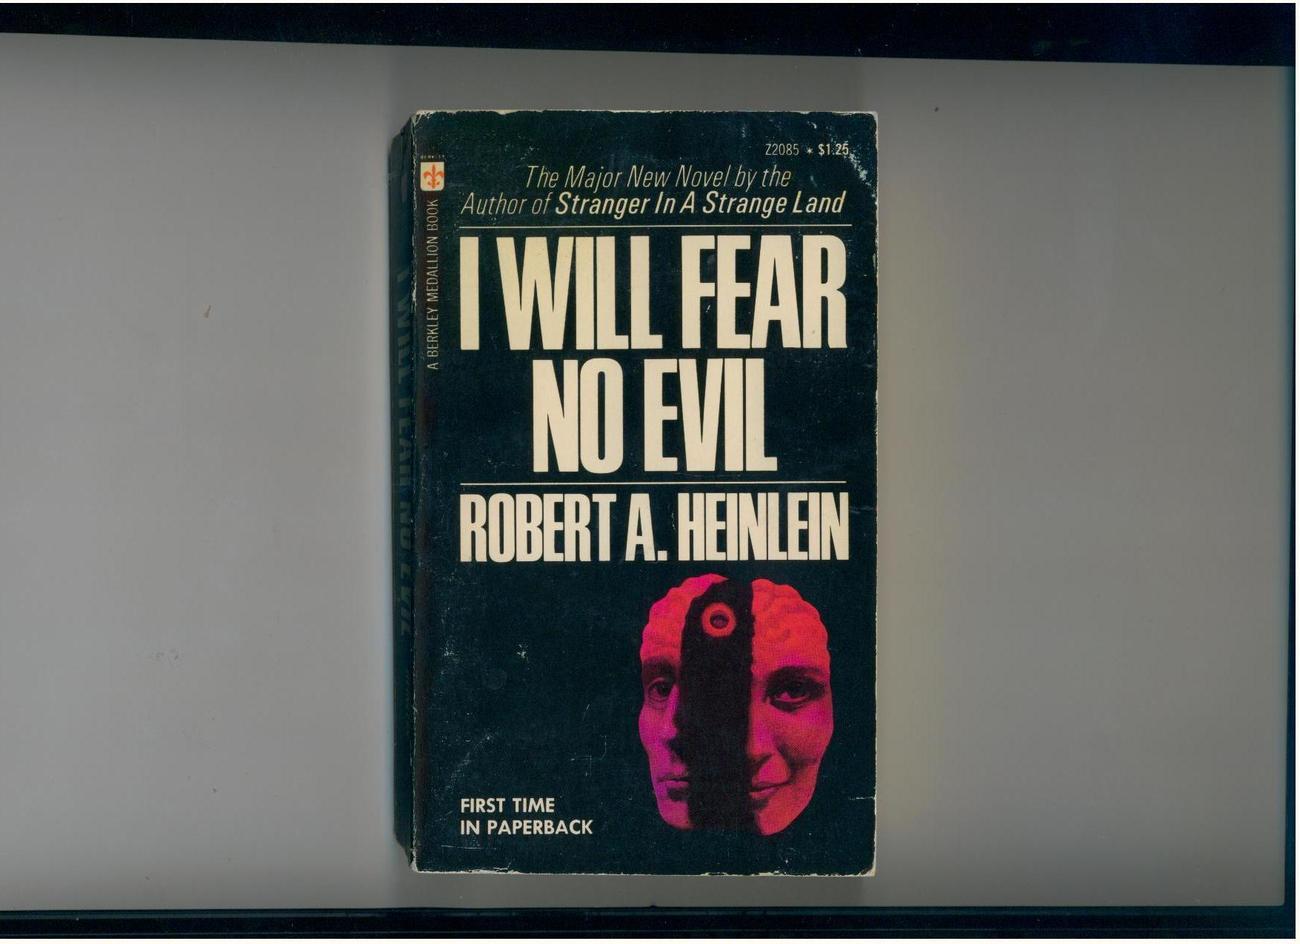 Heinlein - I WILL FEAR NO EVIL -1971 - 1st pb printing